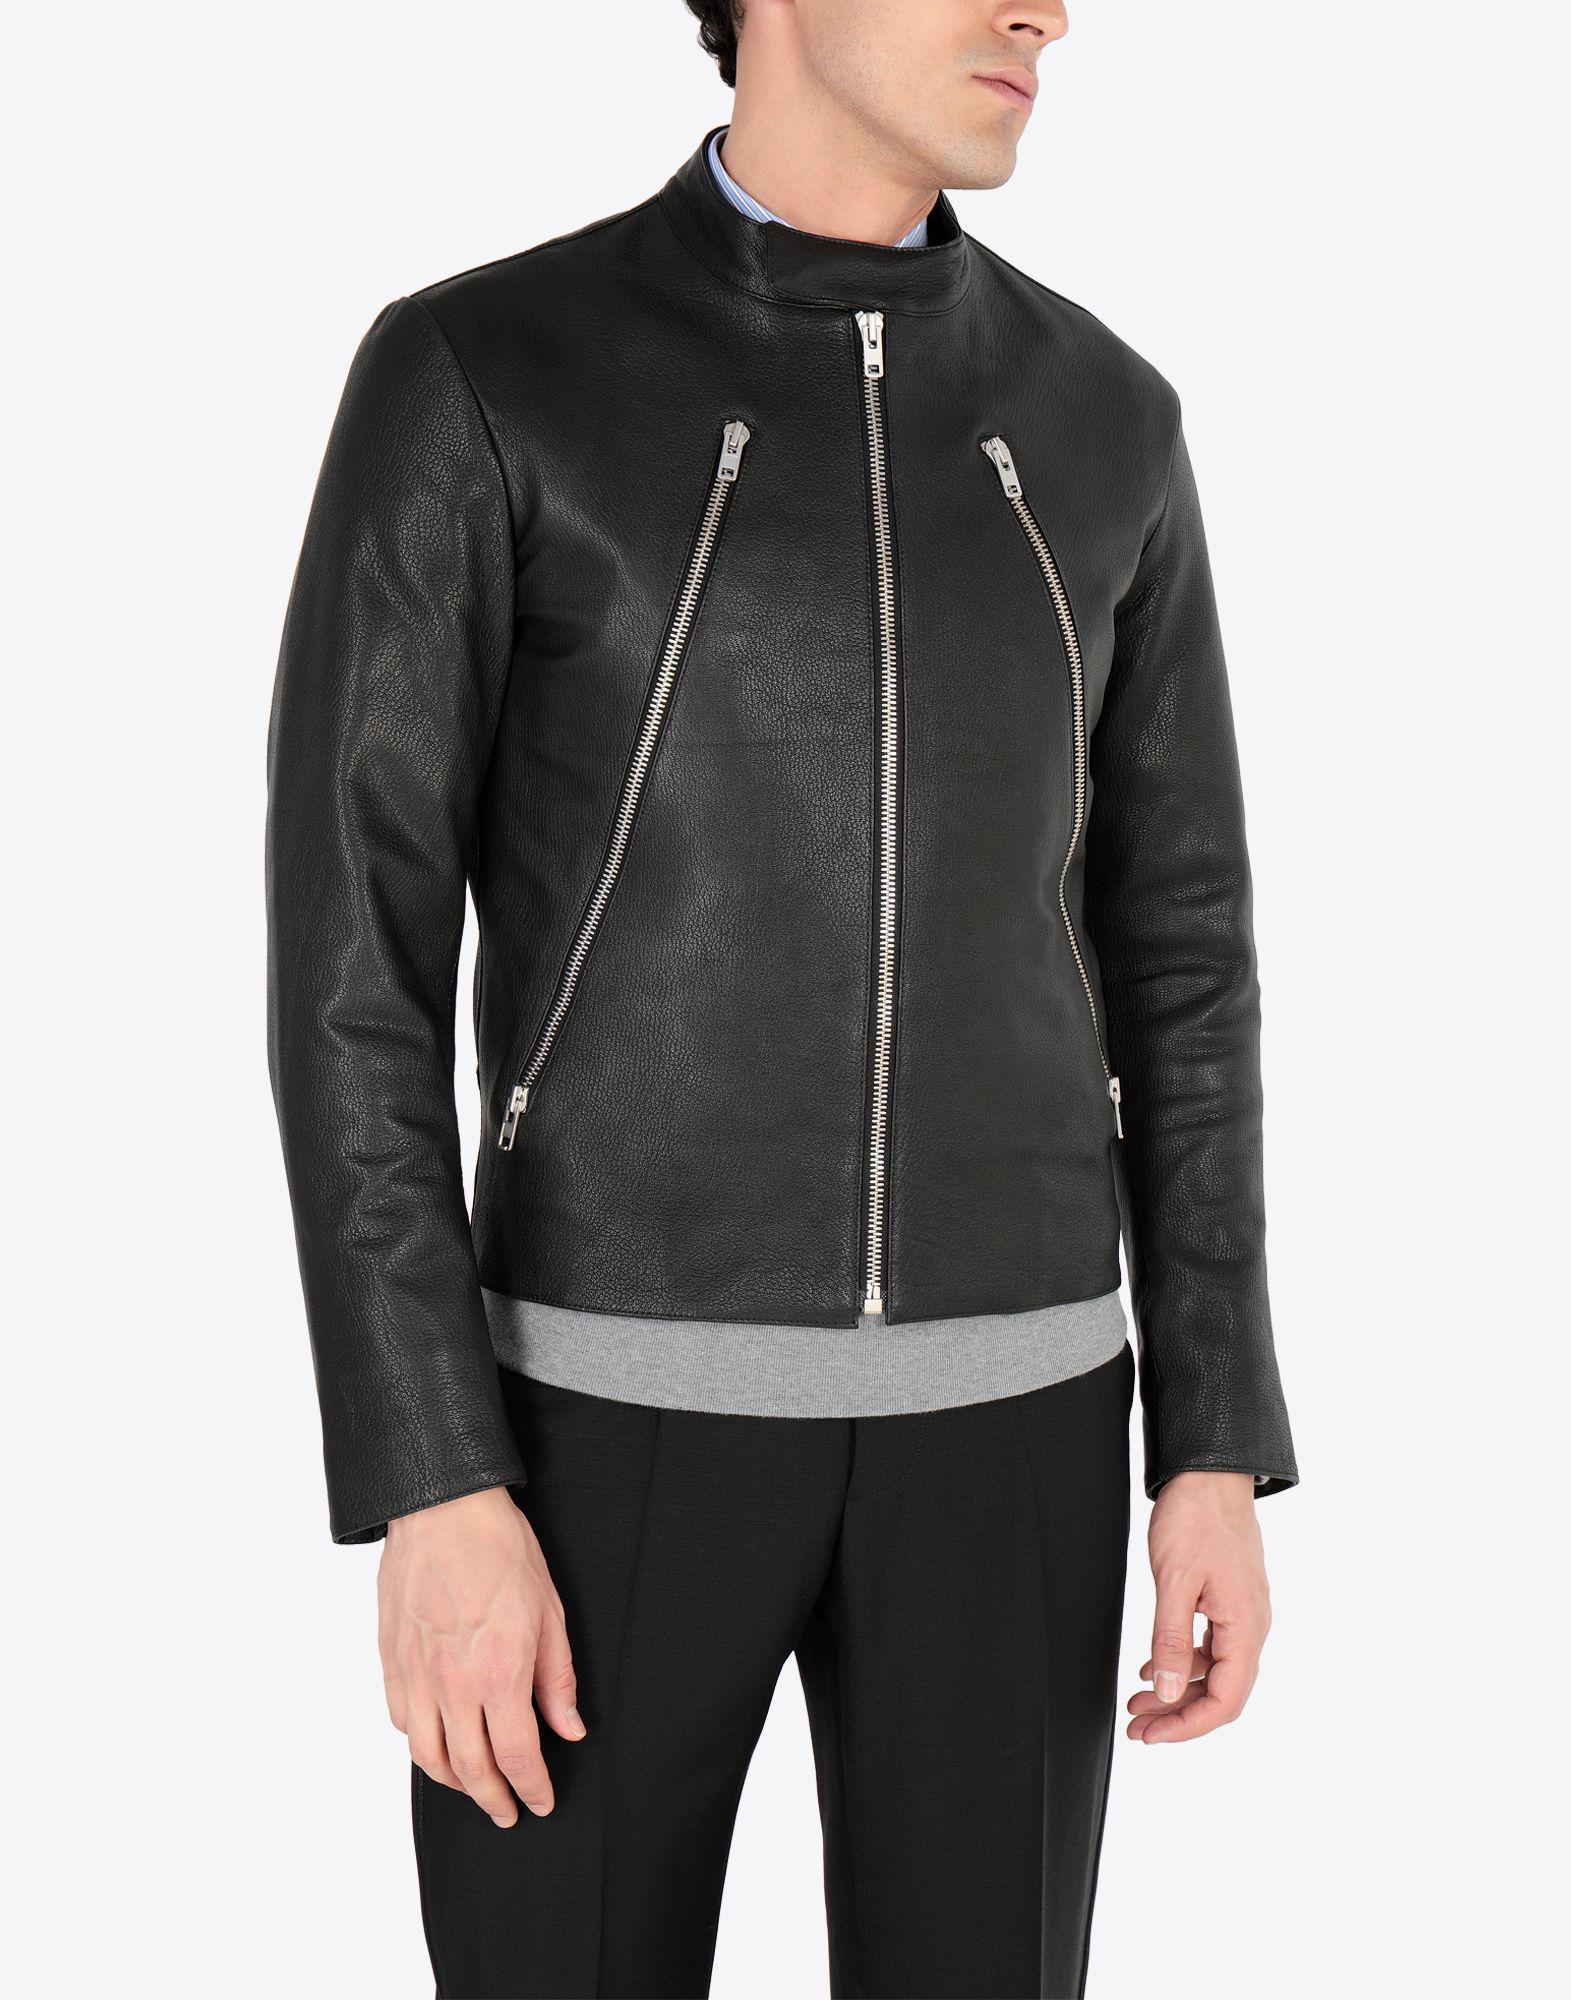 Maison Margiela Leather Sports Jacket in Black for Men